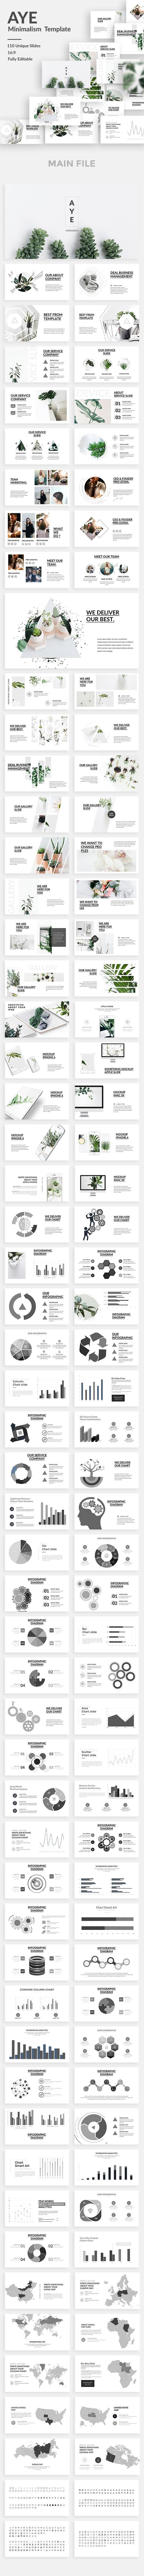 AYE Minimalism Keynote Template - Creative Keynote Templates